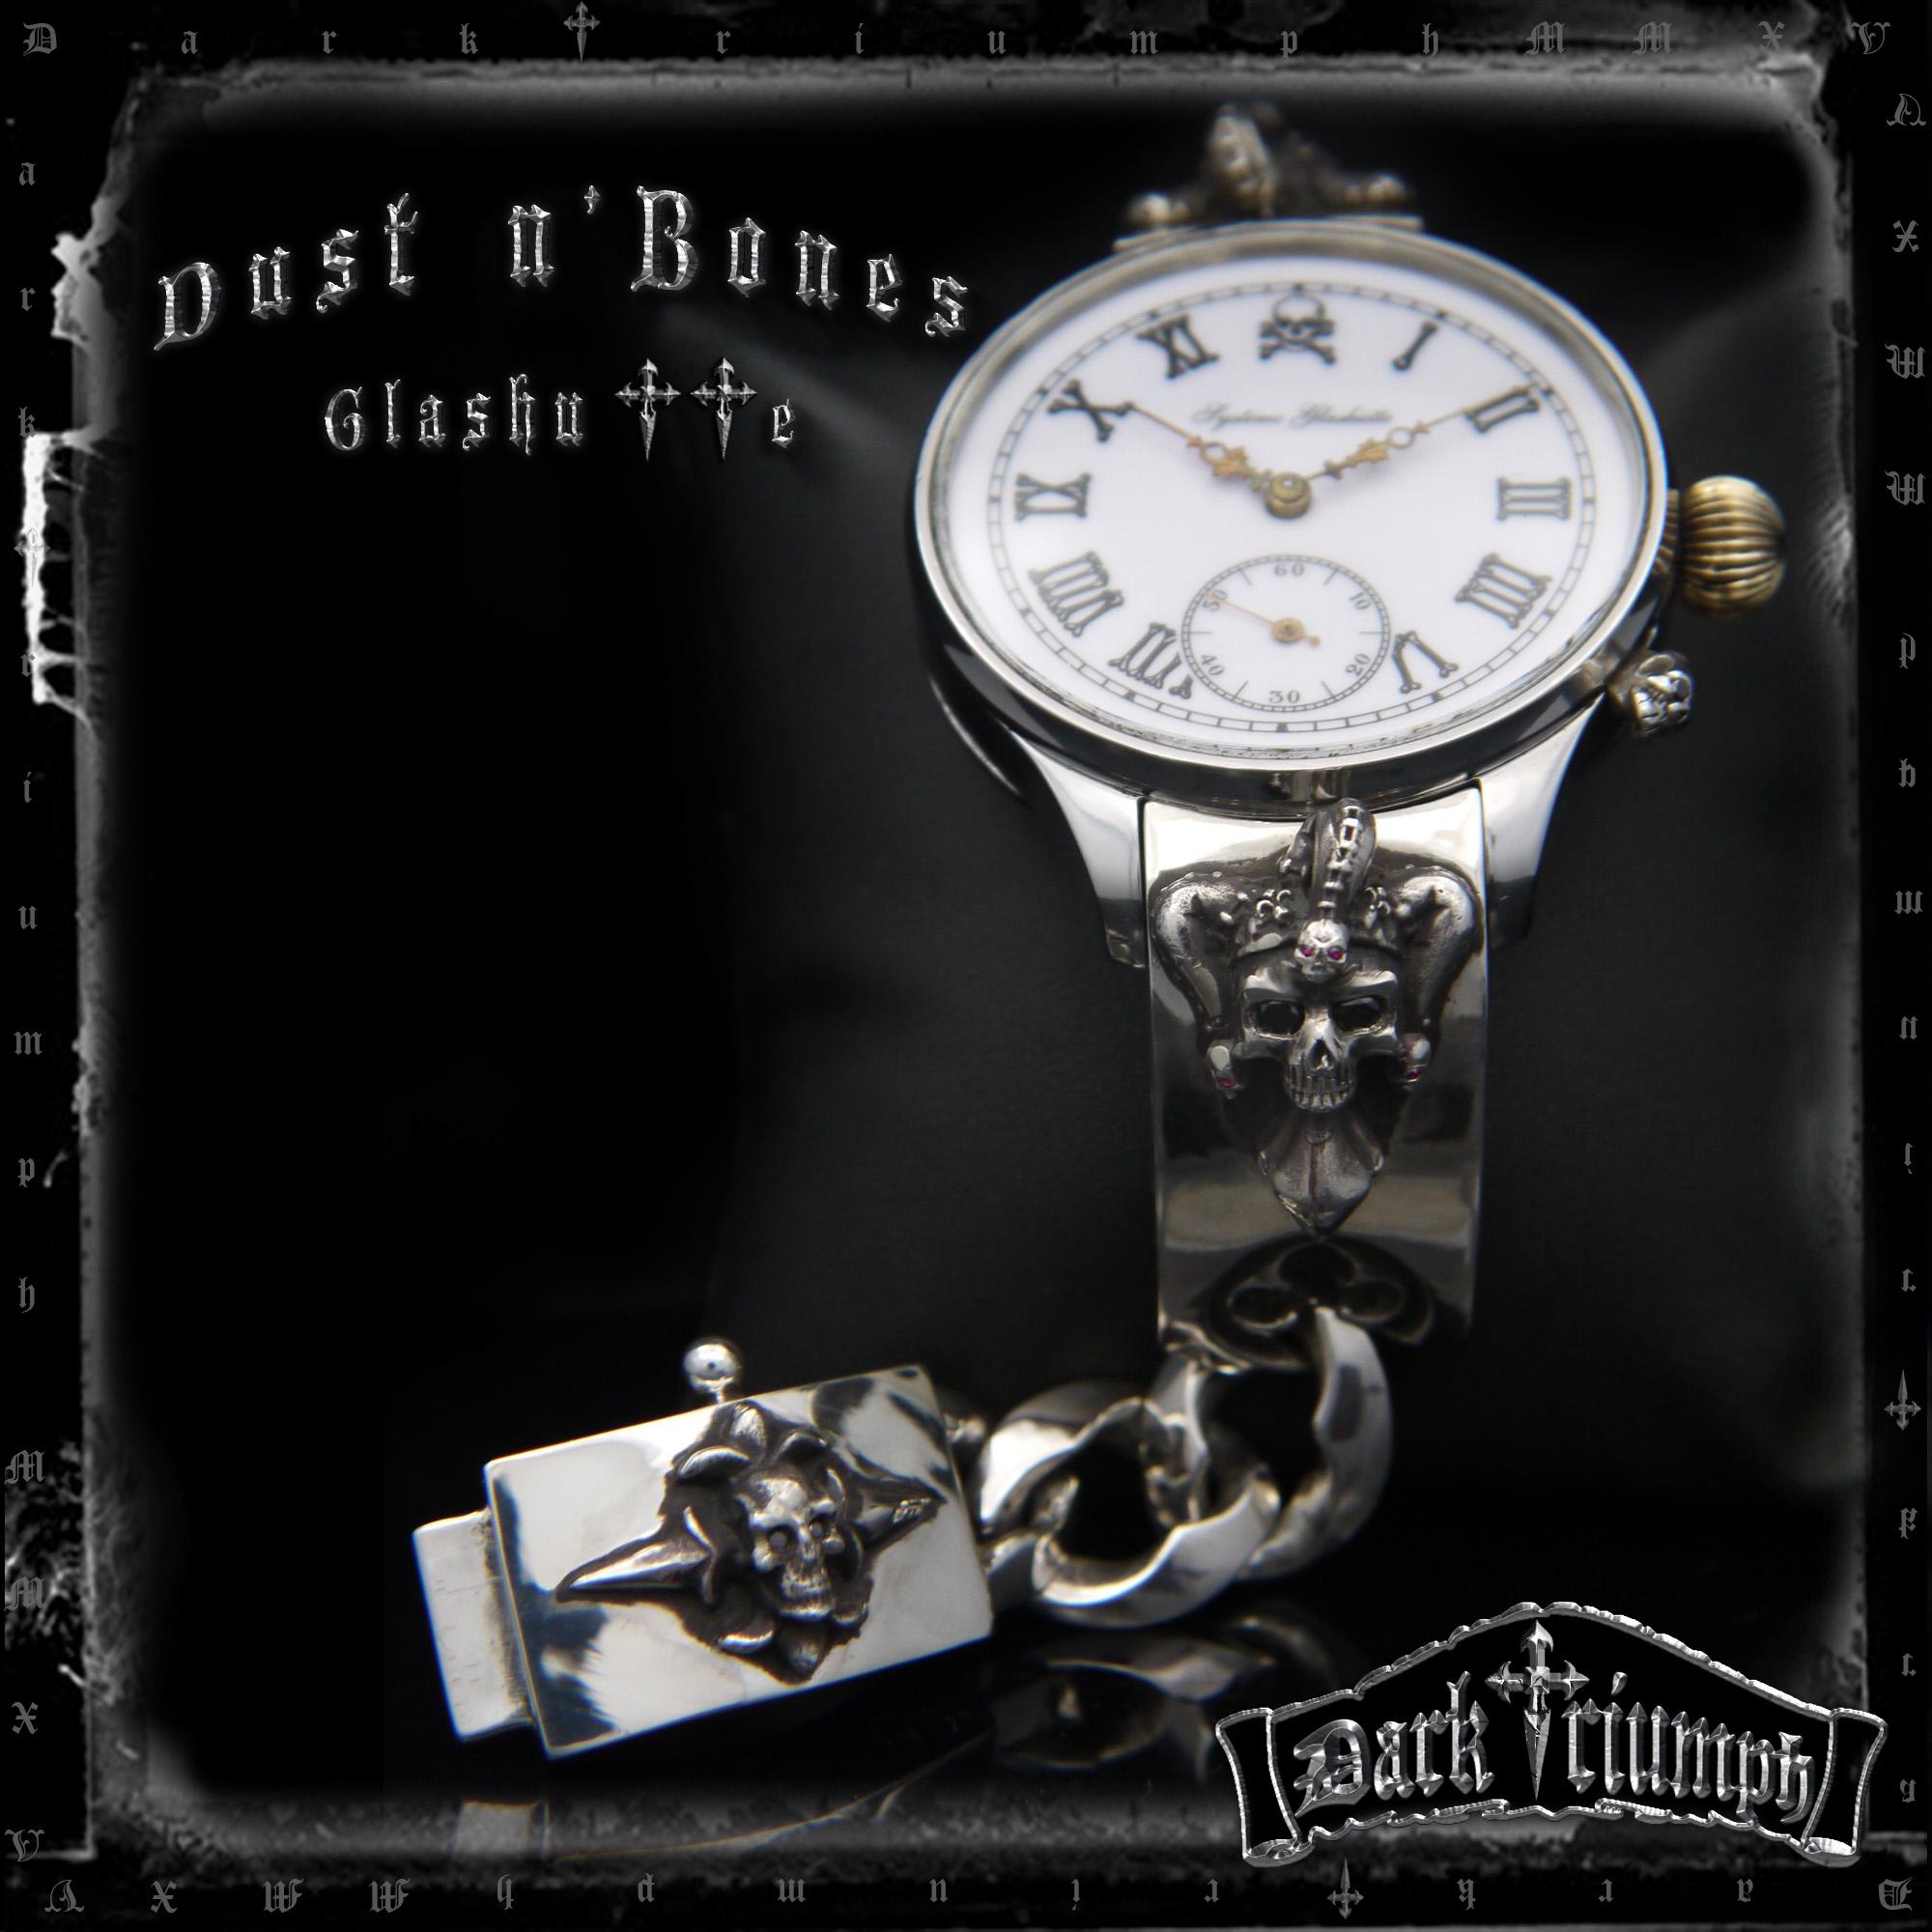 dust-n-bones-glashutte-titled.jpg